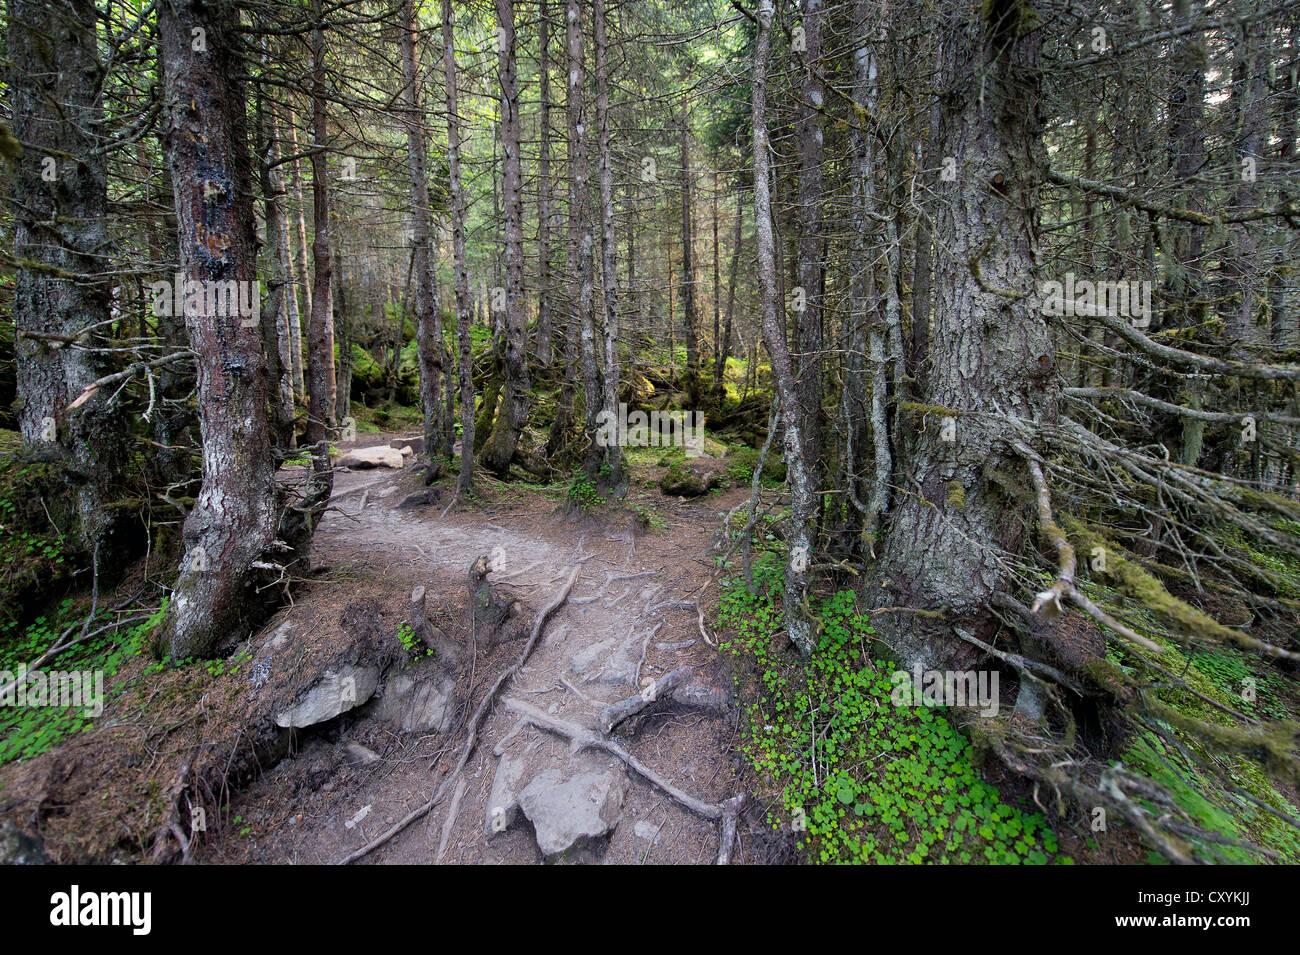 Forest track, Grawa Alm alp, Stubaital valley, Tyrol, Austria, Europe - Stock Image